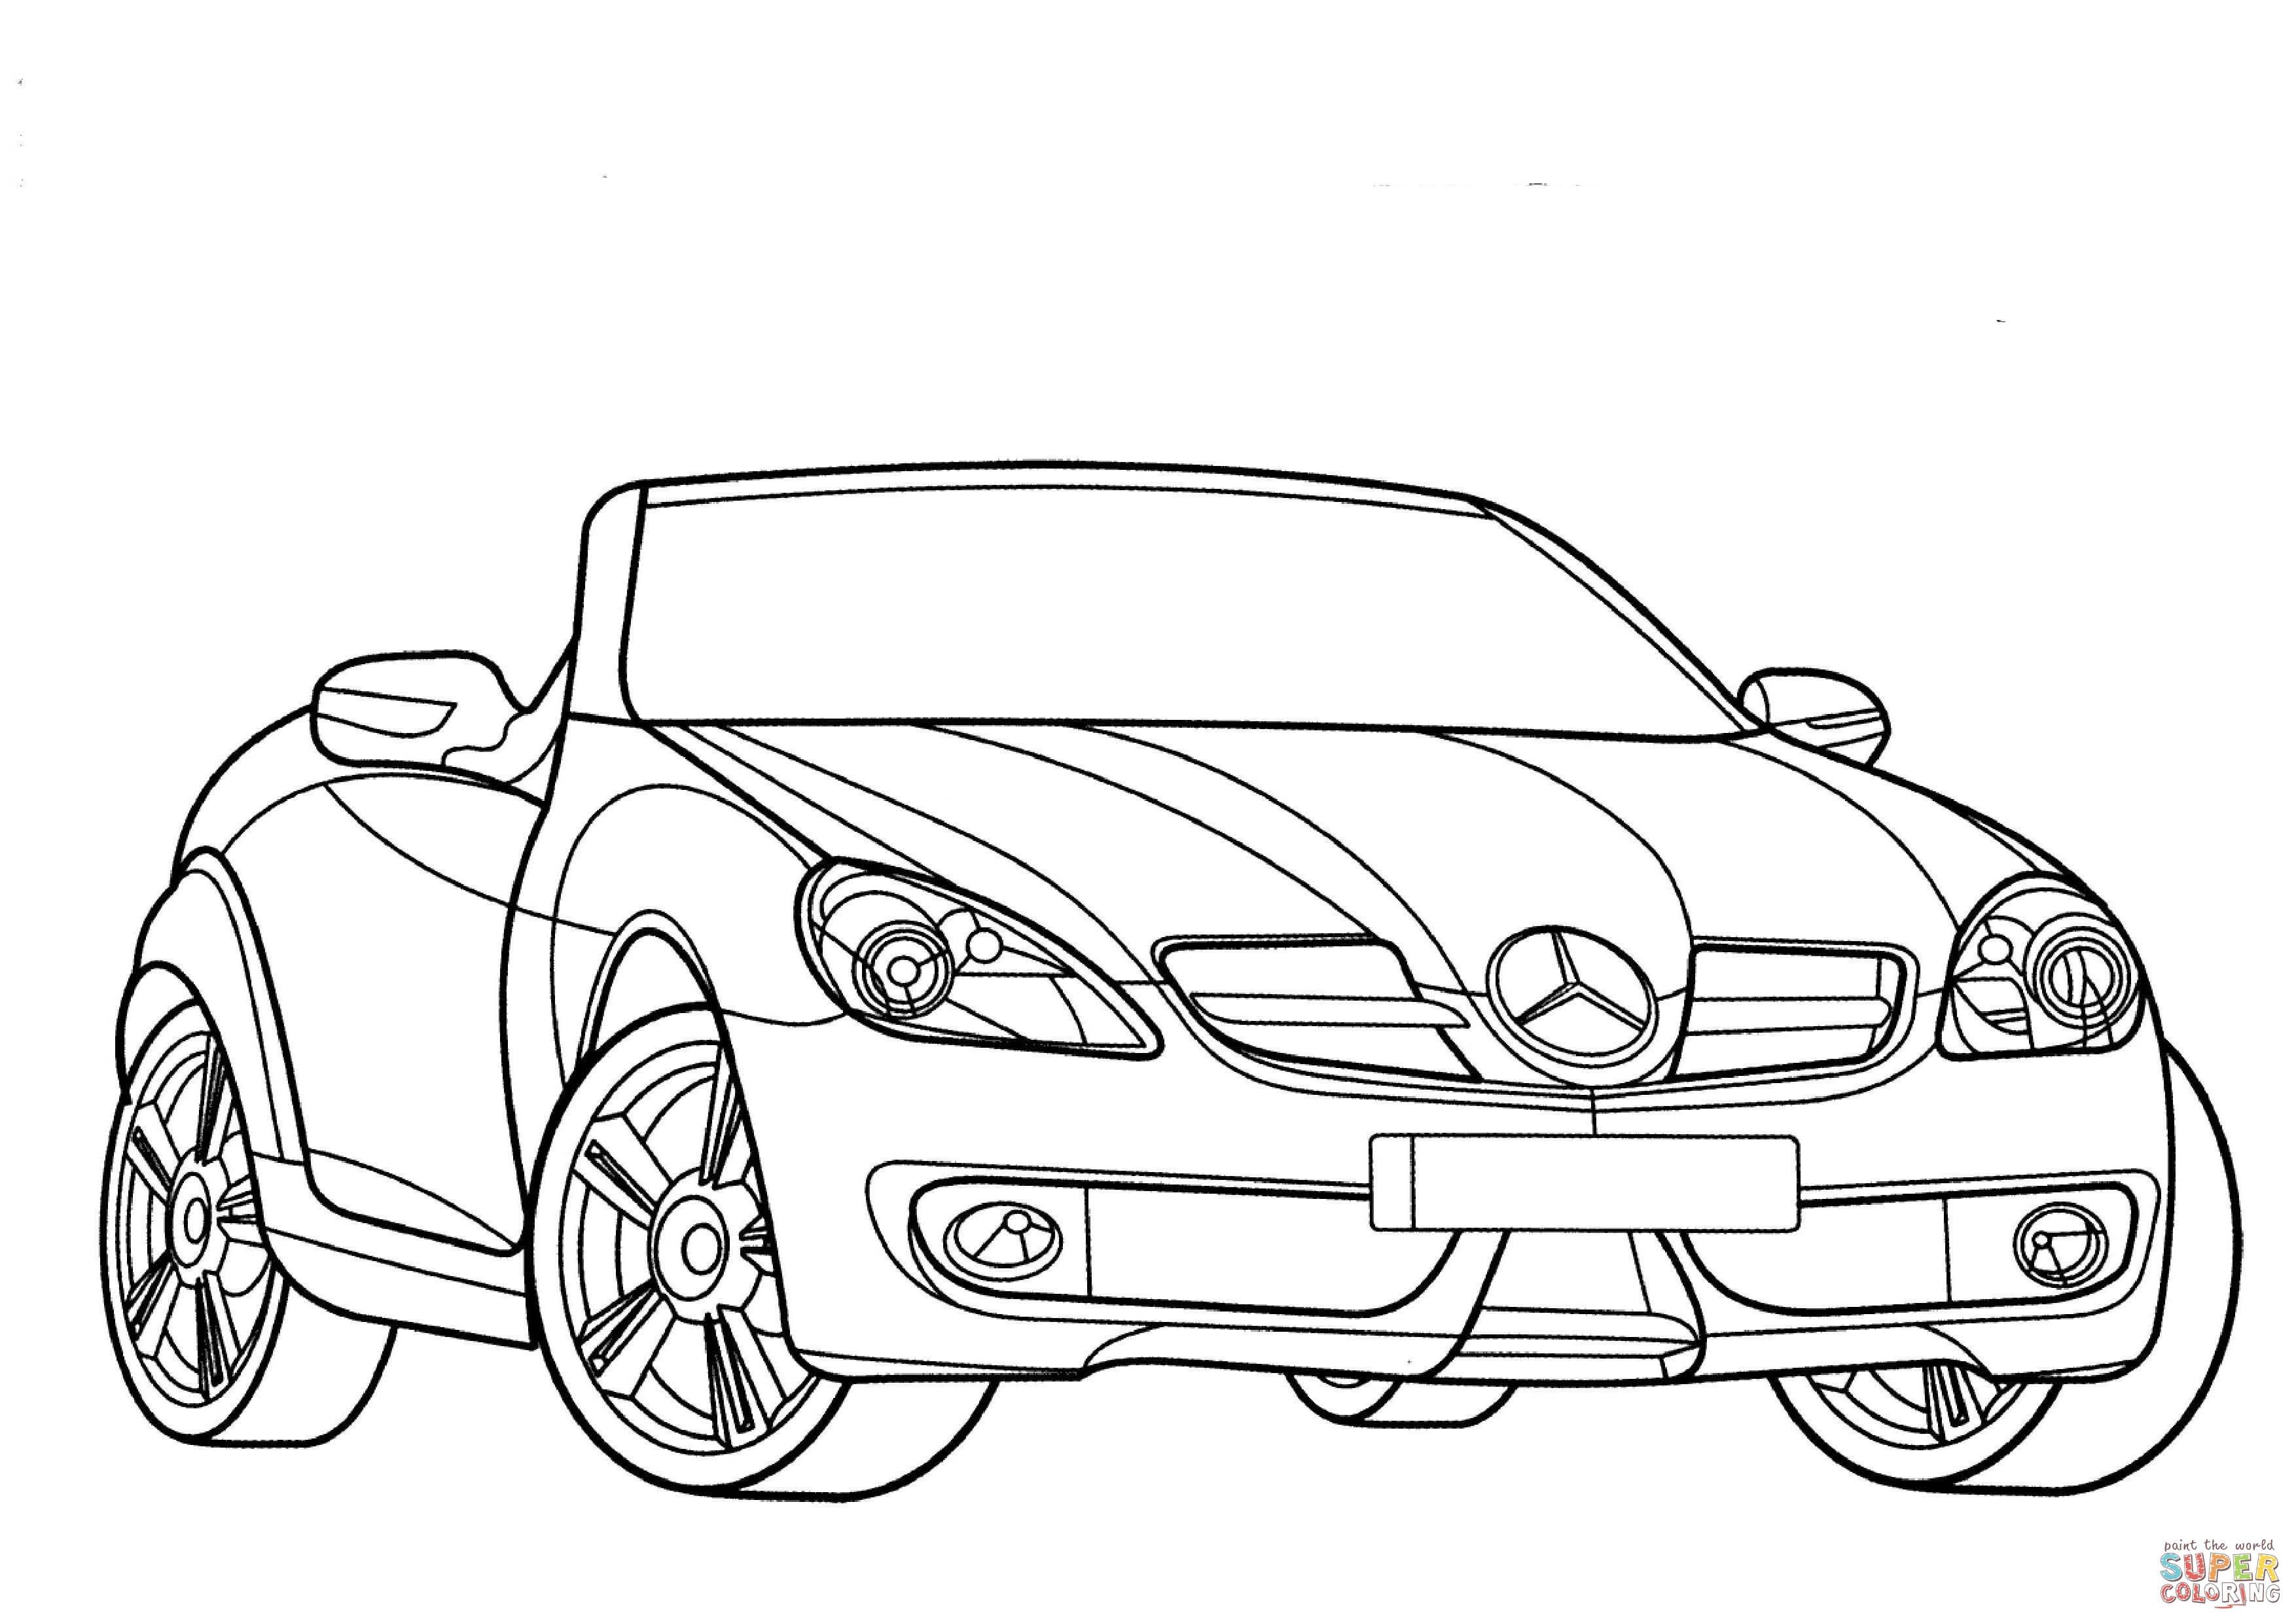 Mercedes Benz Slk Klass M Larbok